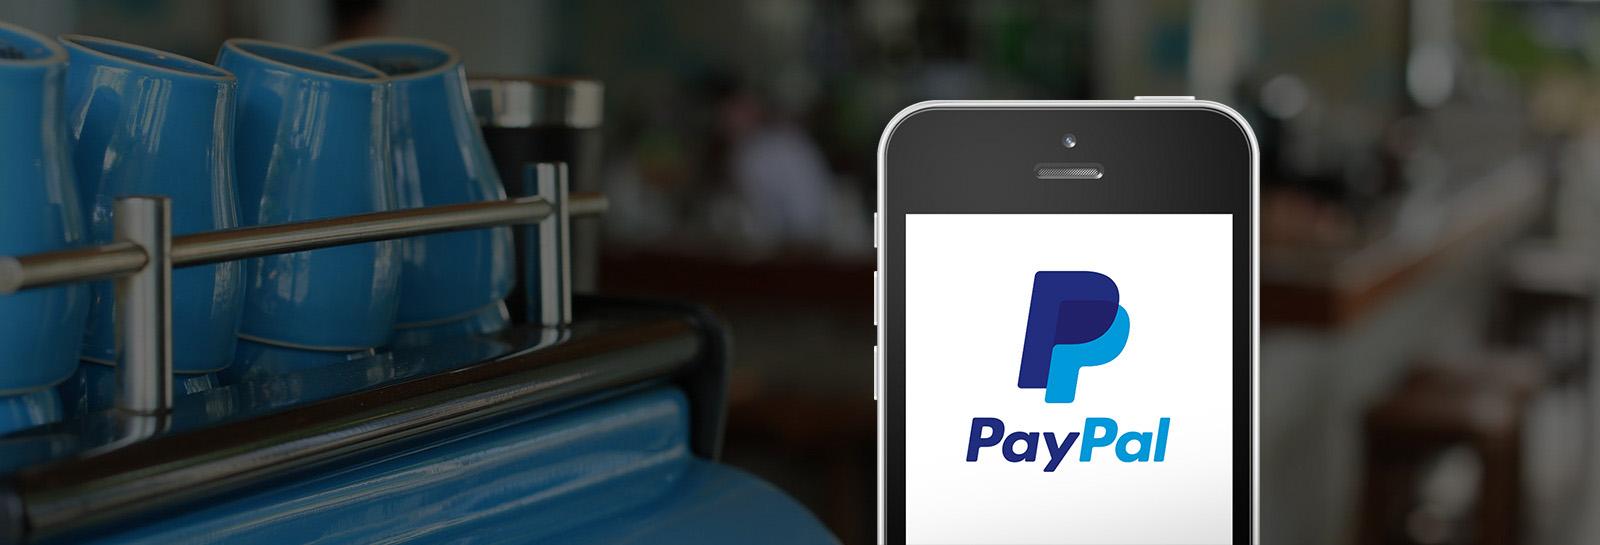 PayPal bei eBay